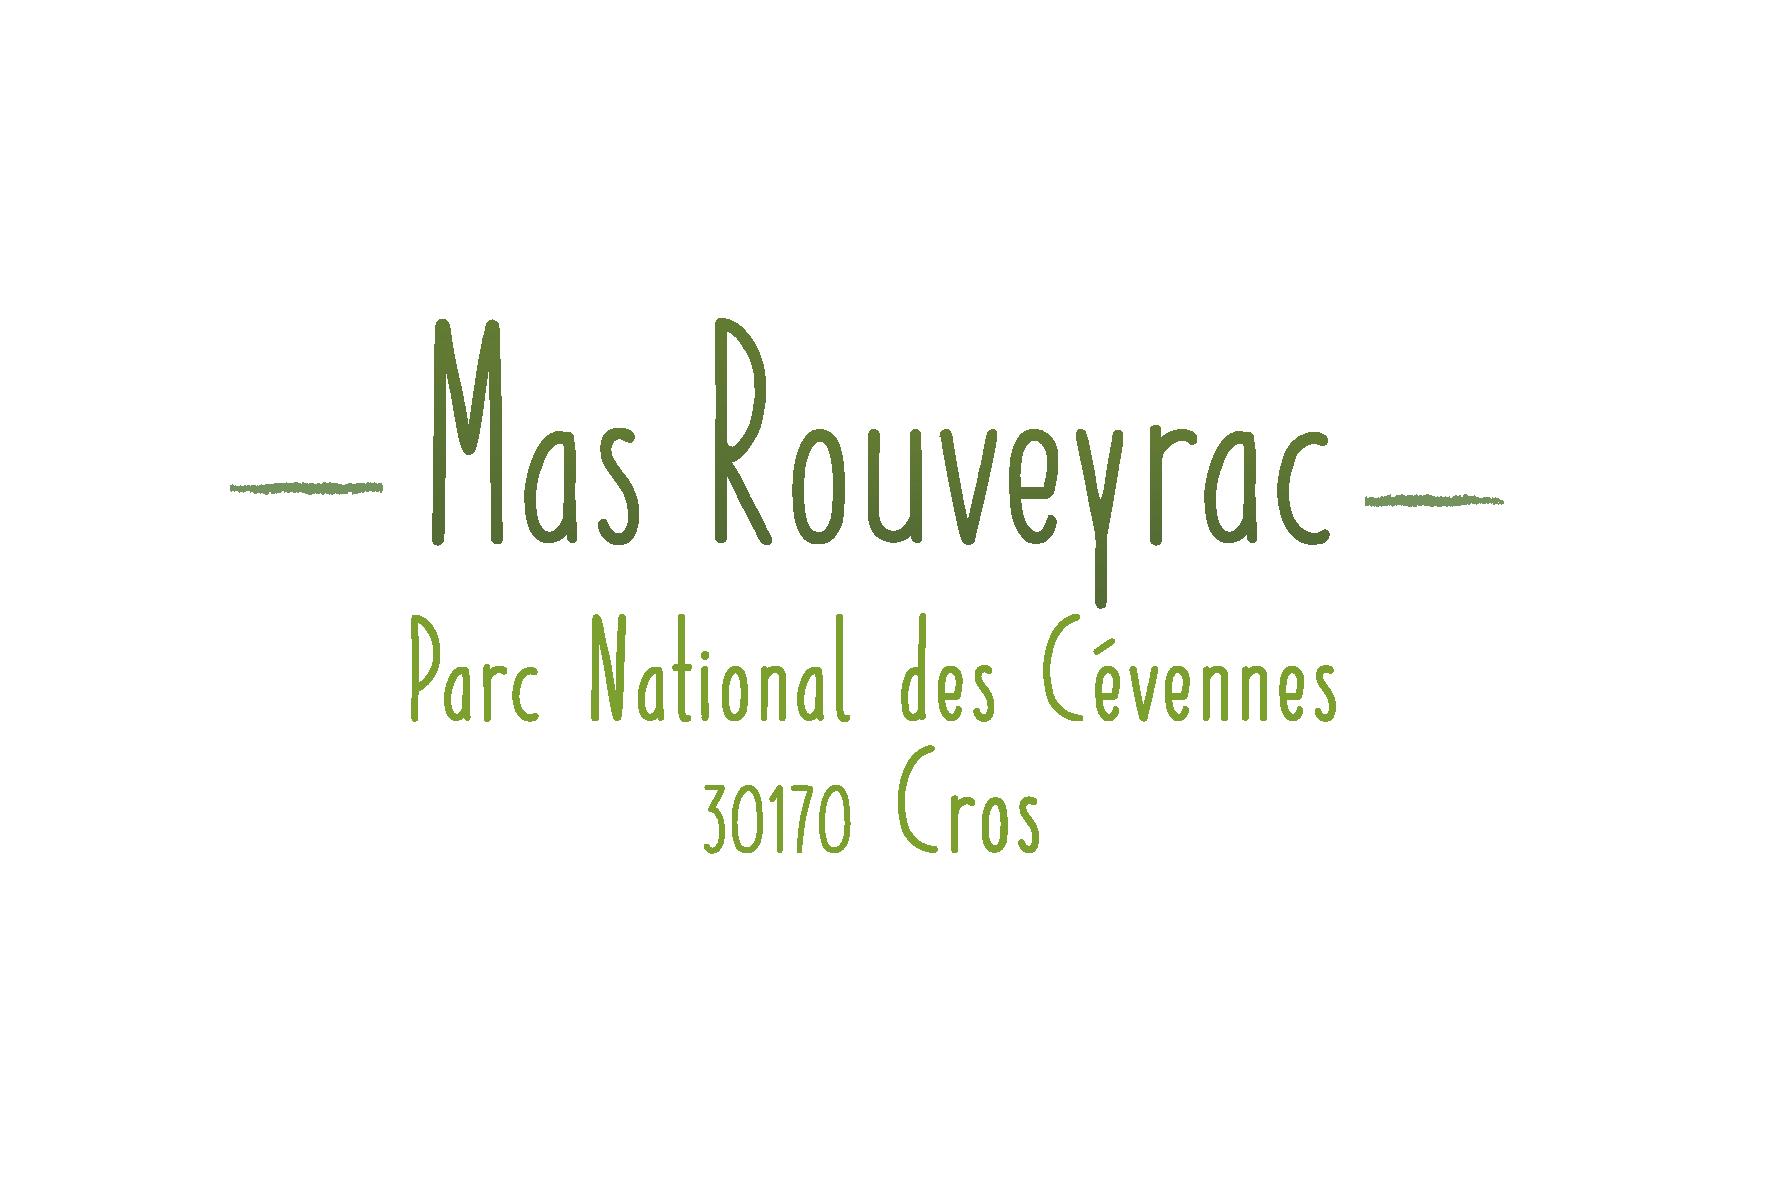 Mas Rouveyrac